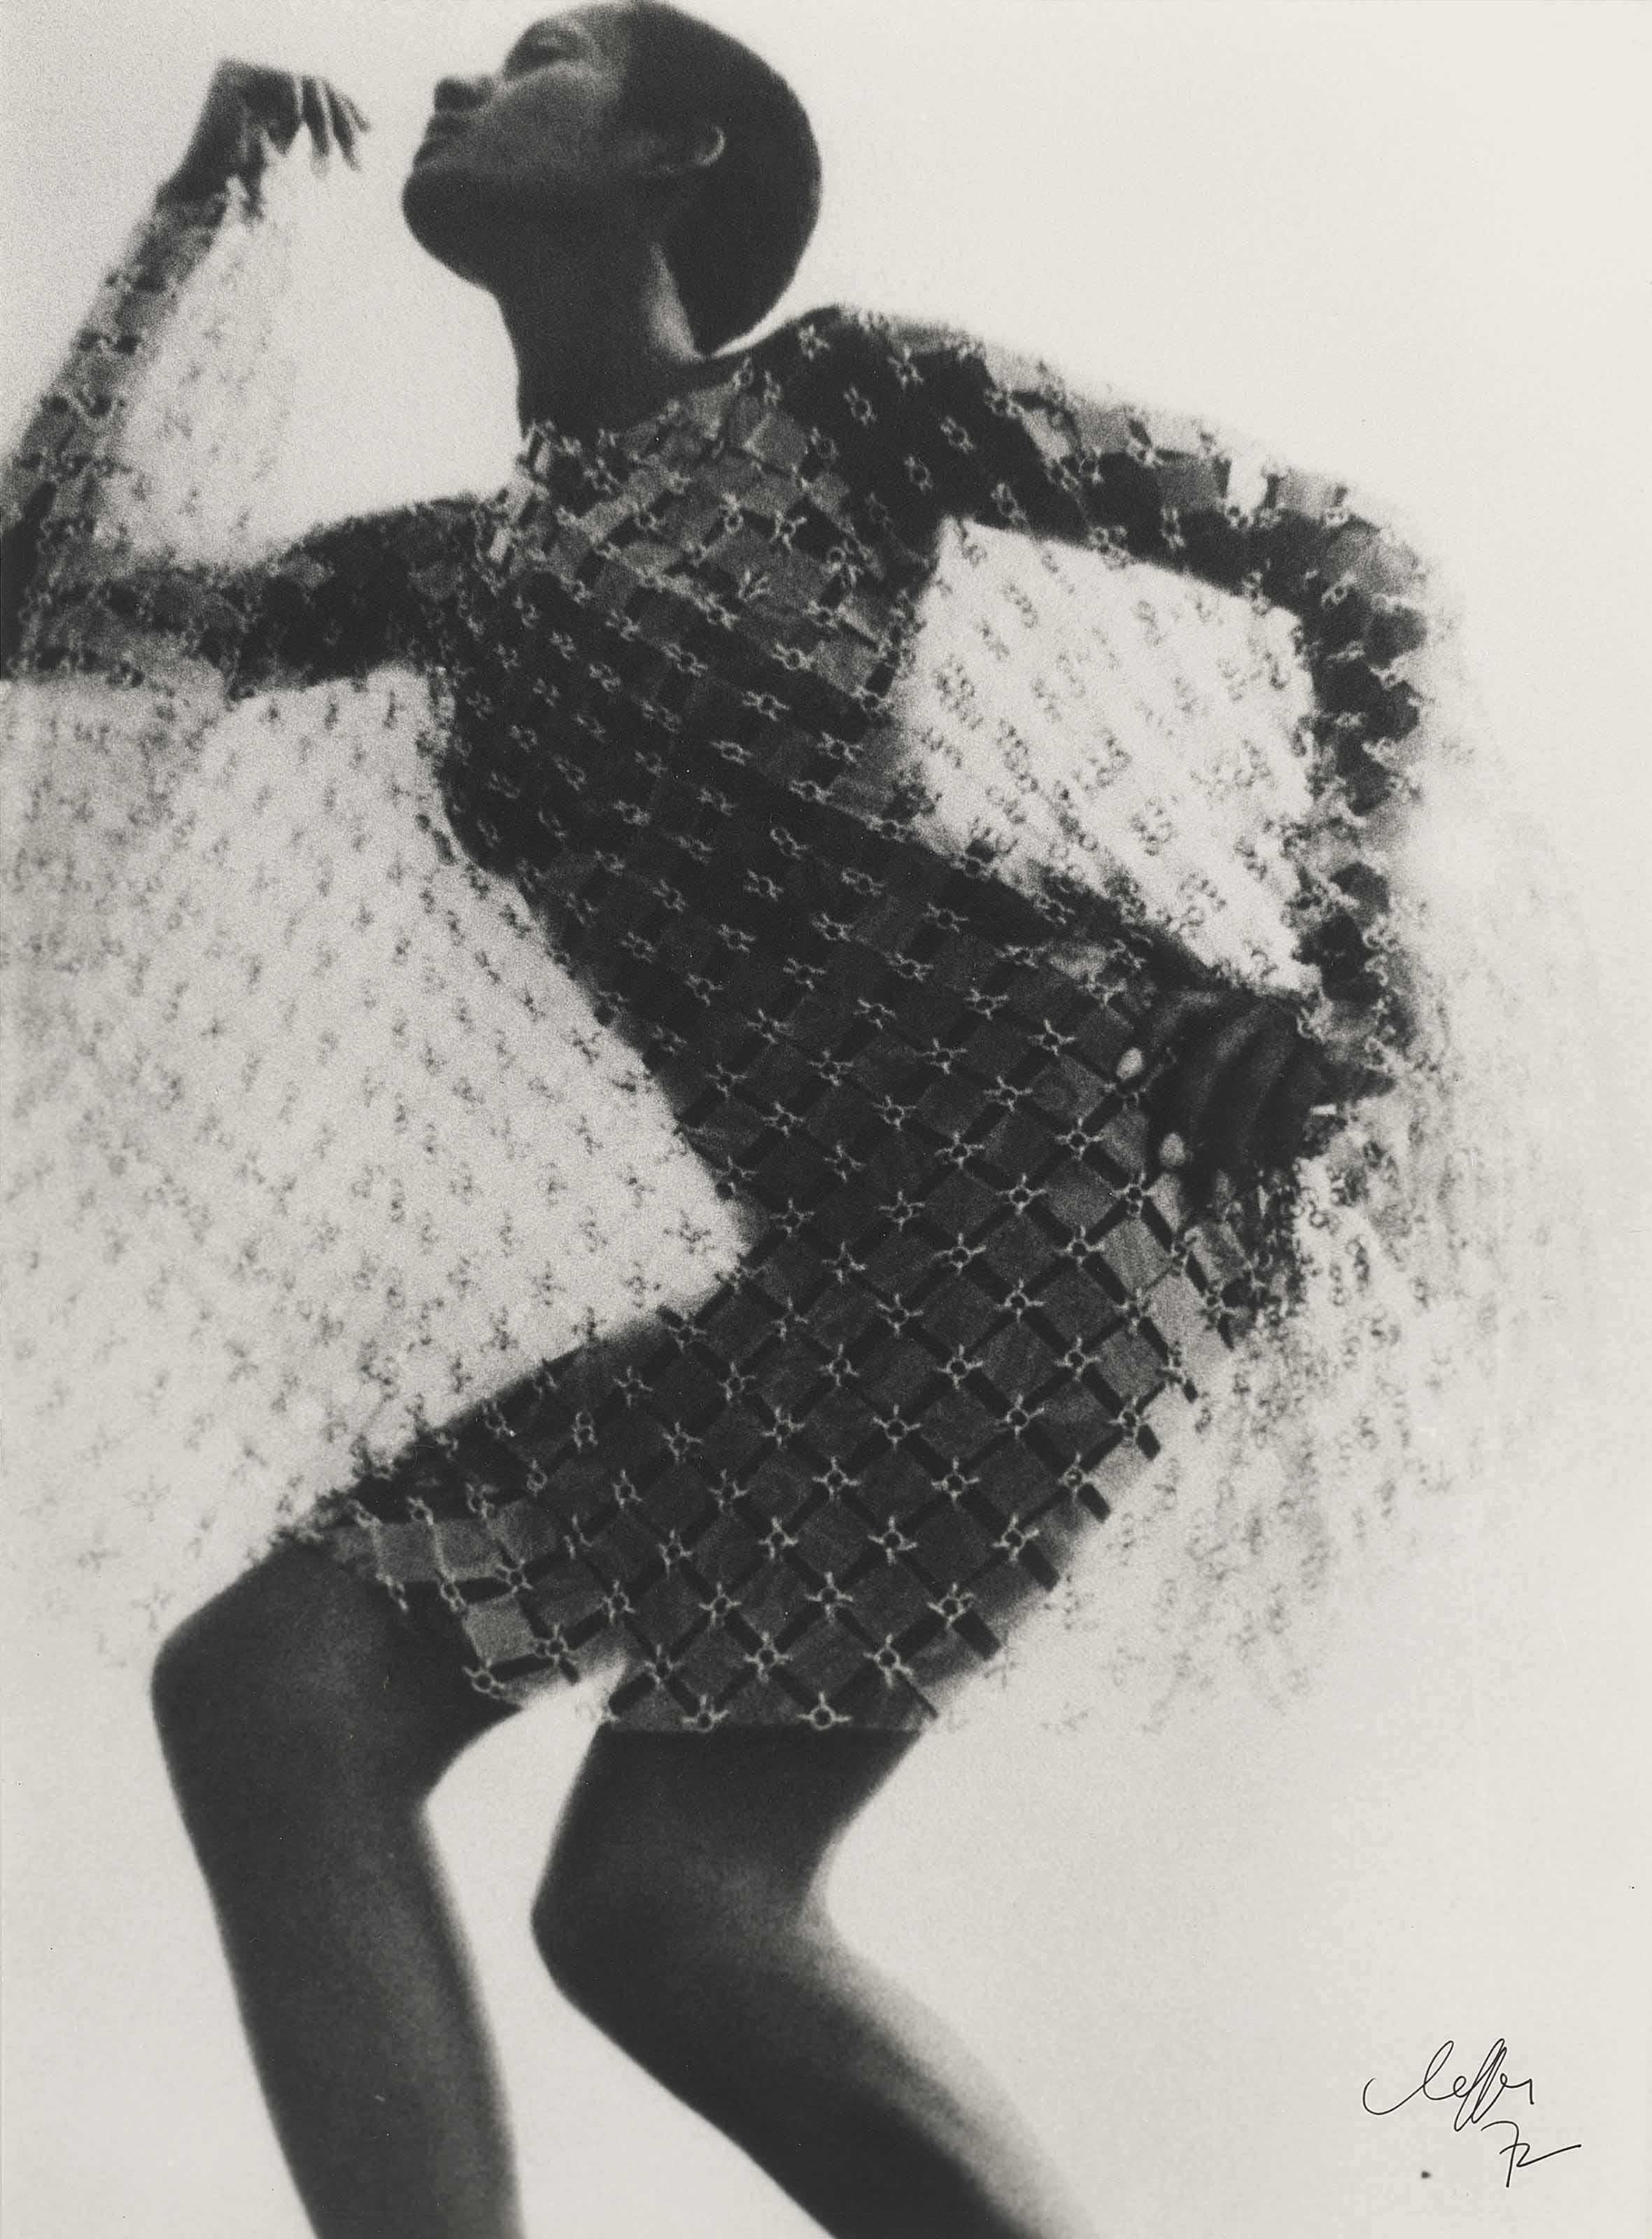 Paco Rabanne dress, 1969